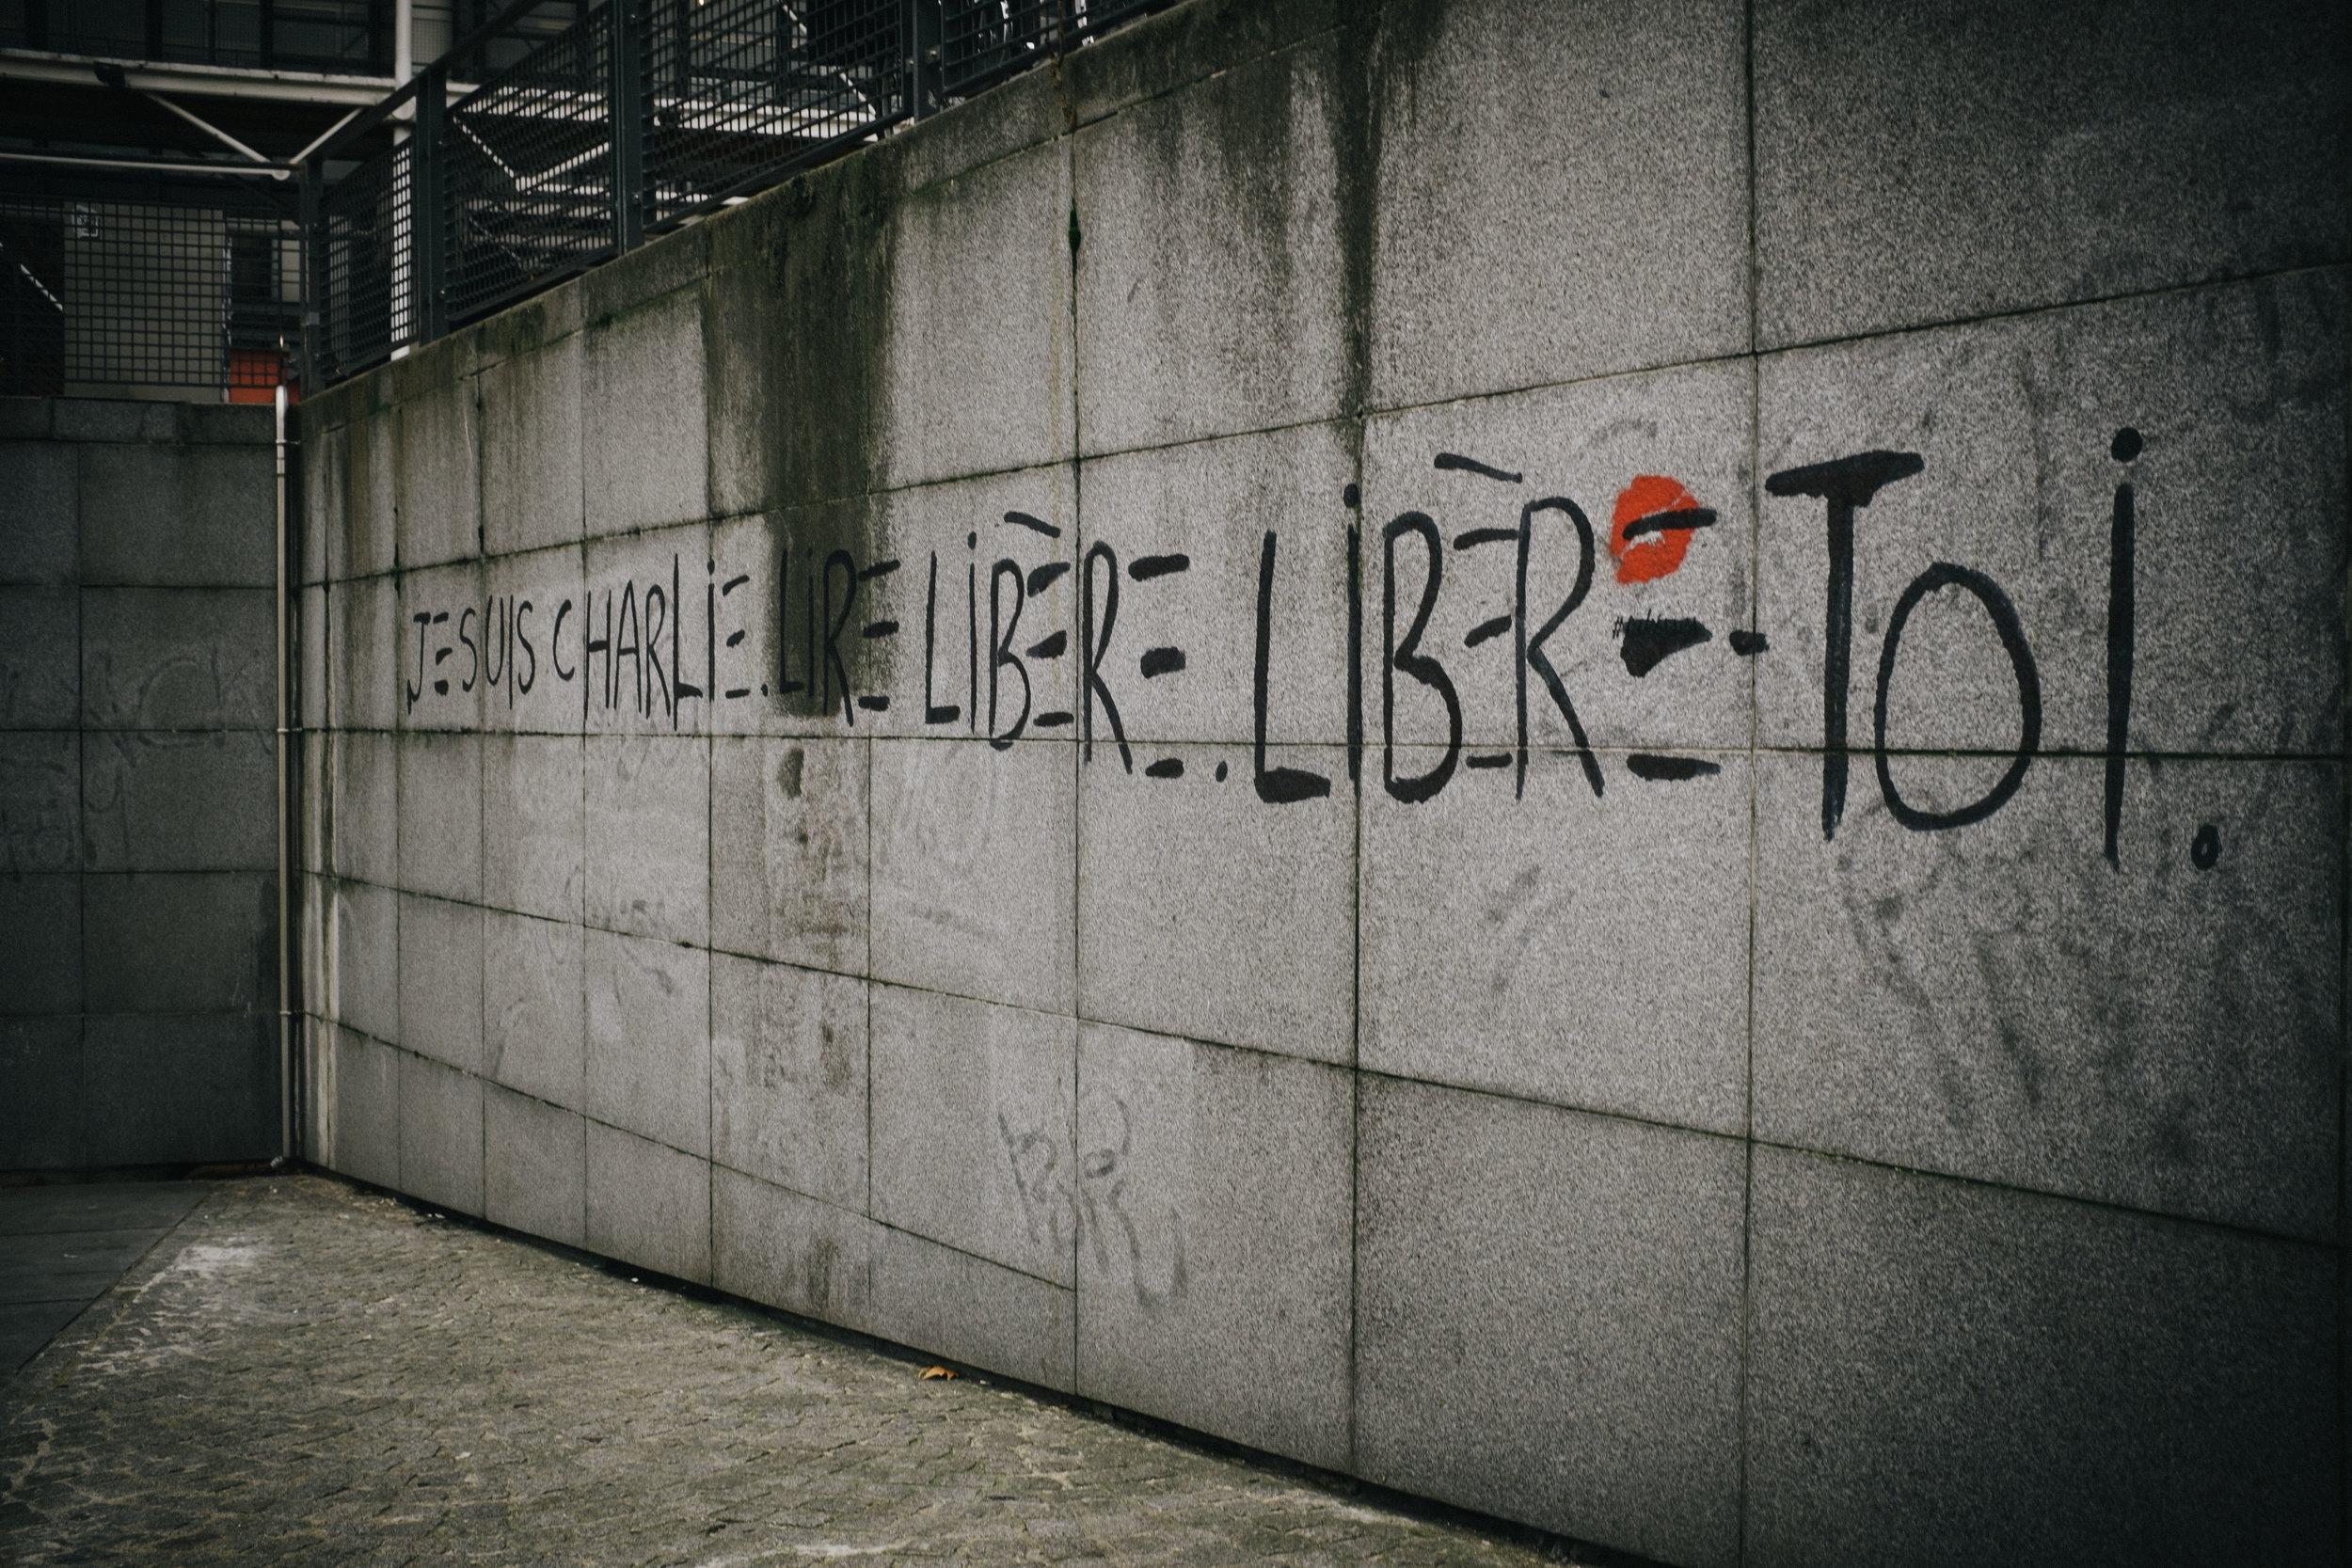 Paris-DSCF2720-2.jpg